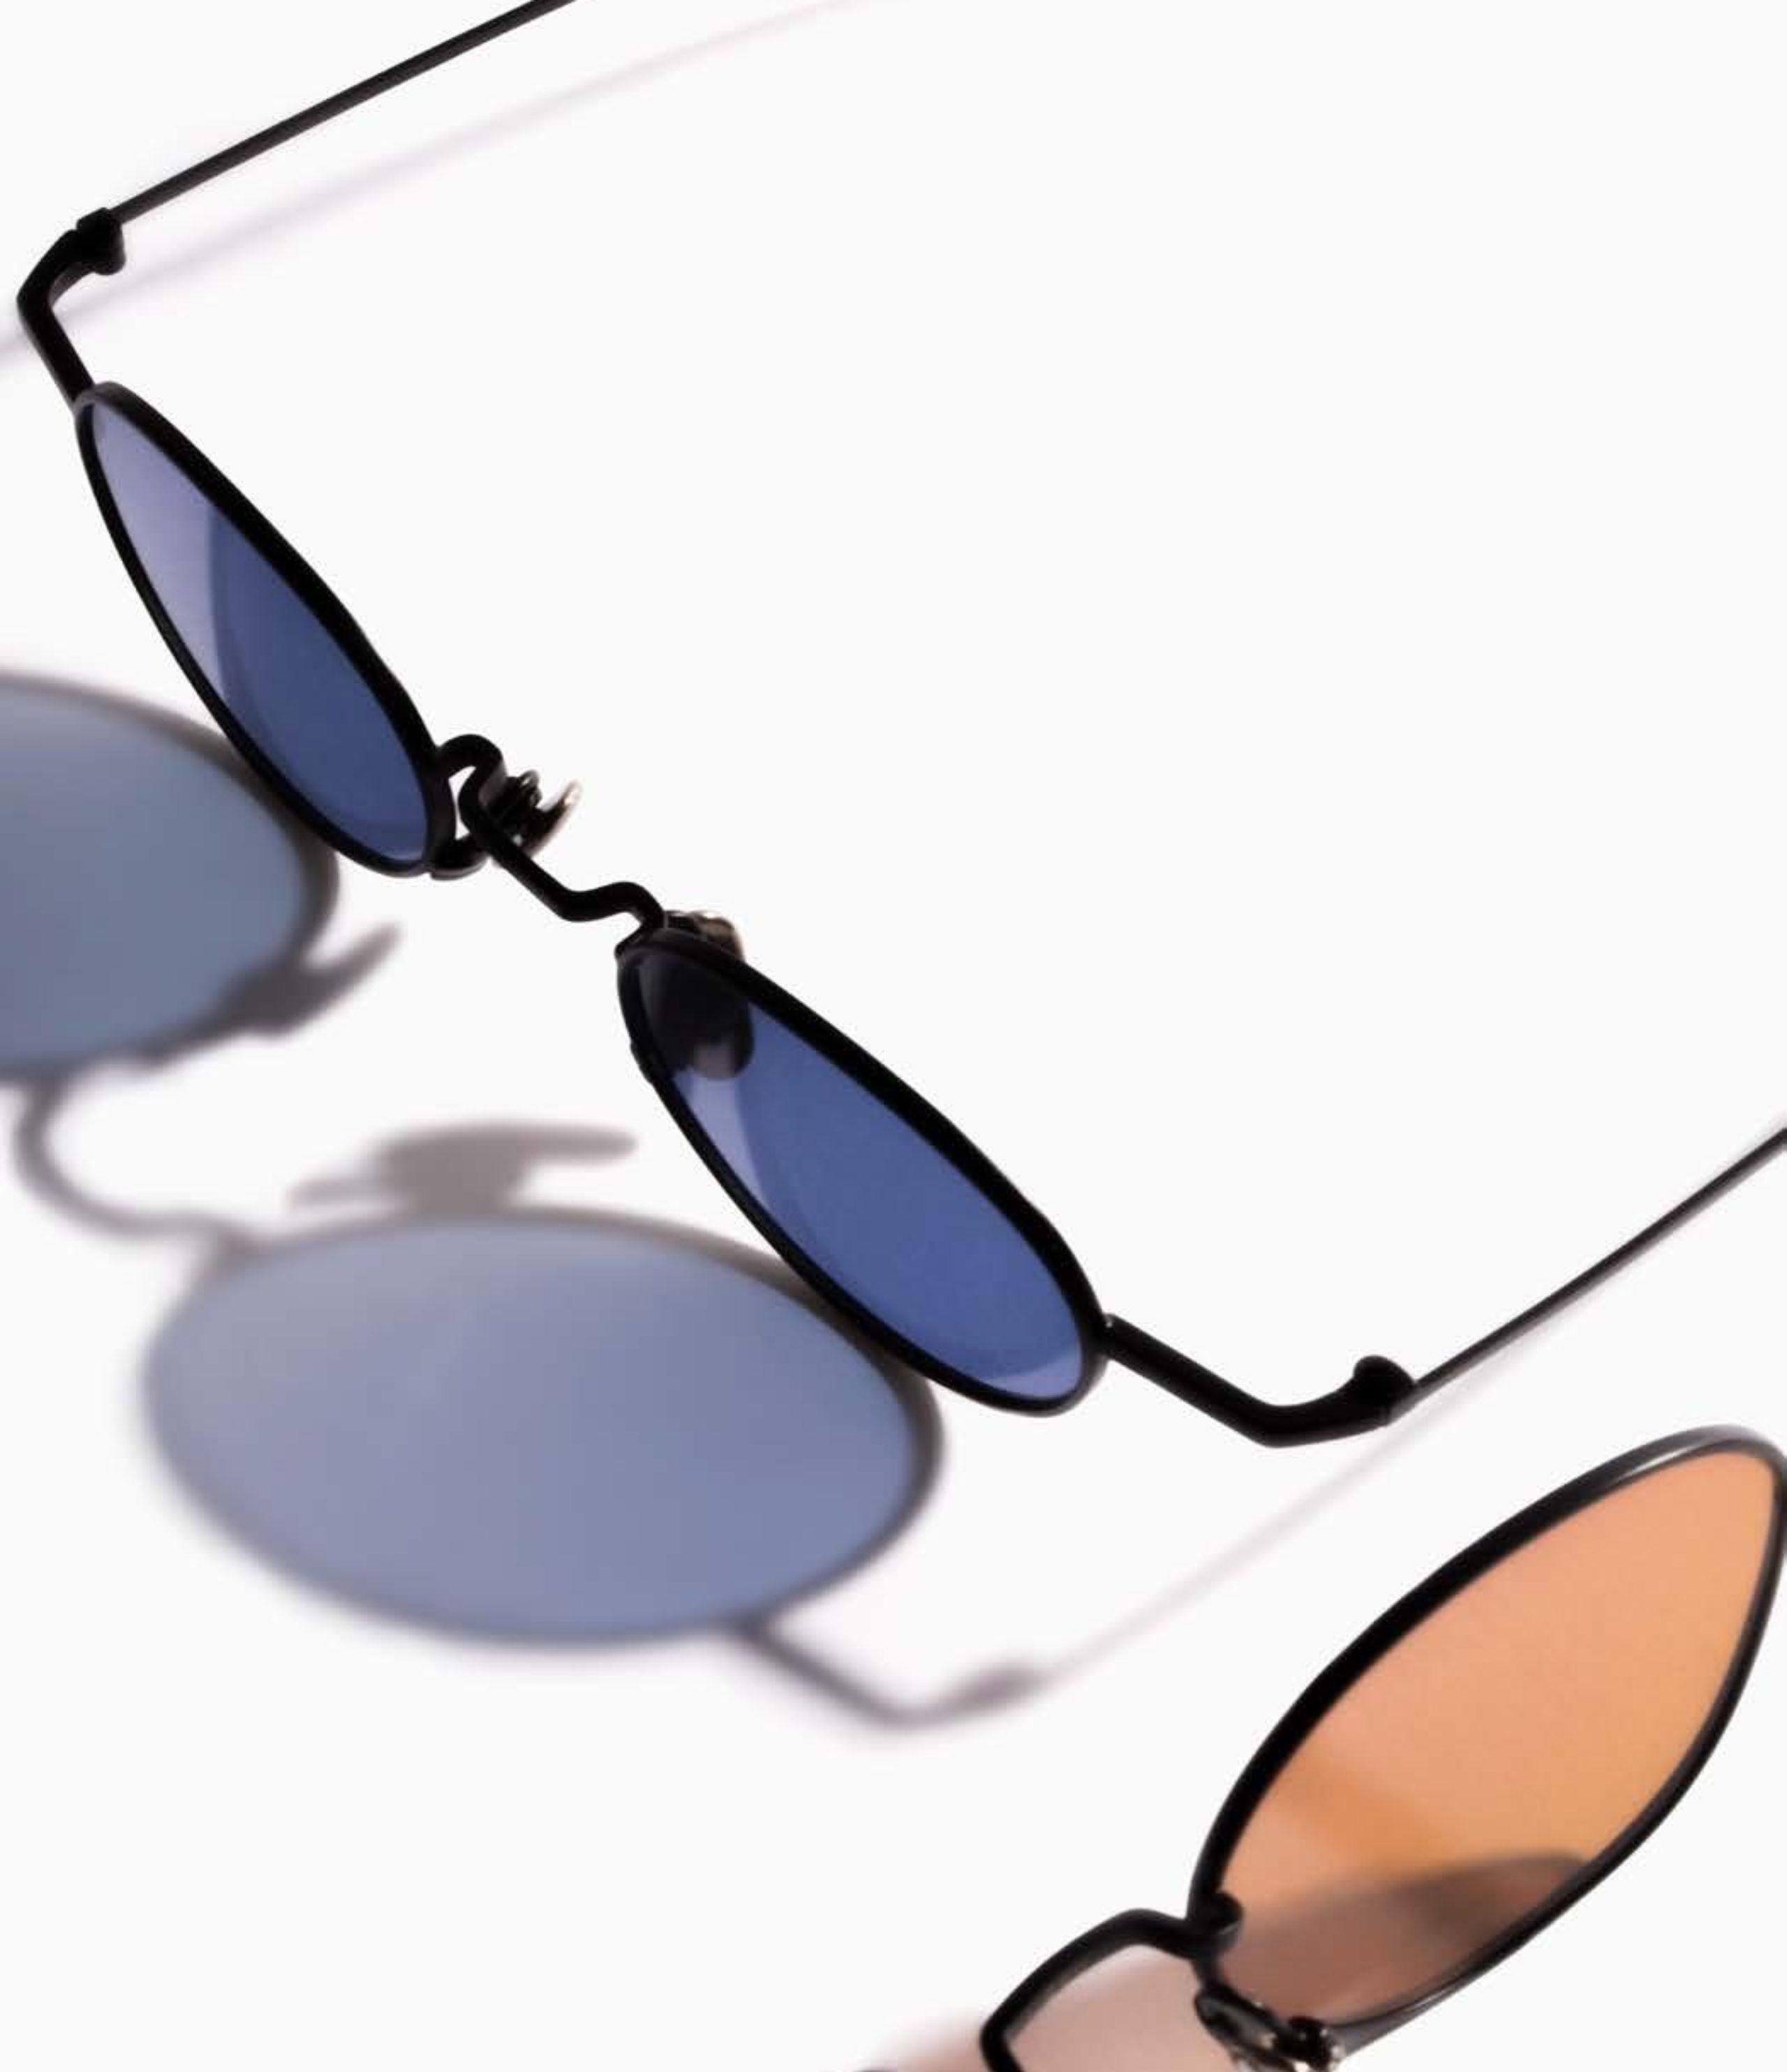 Komono brillen en zonnebrillen - Frames and Faces